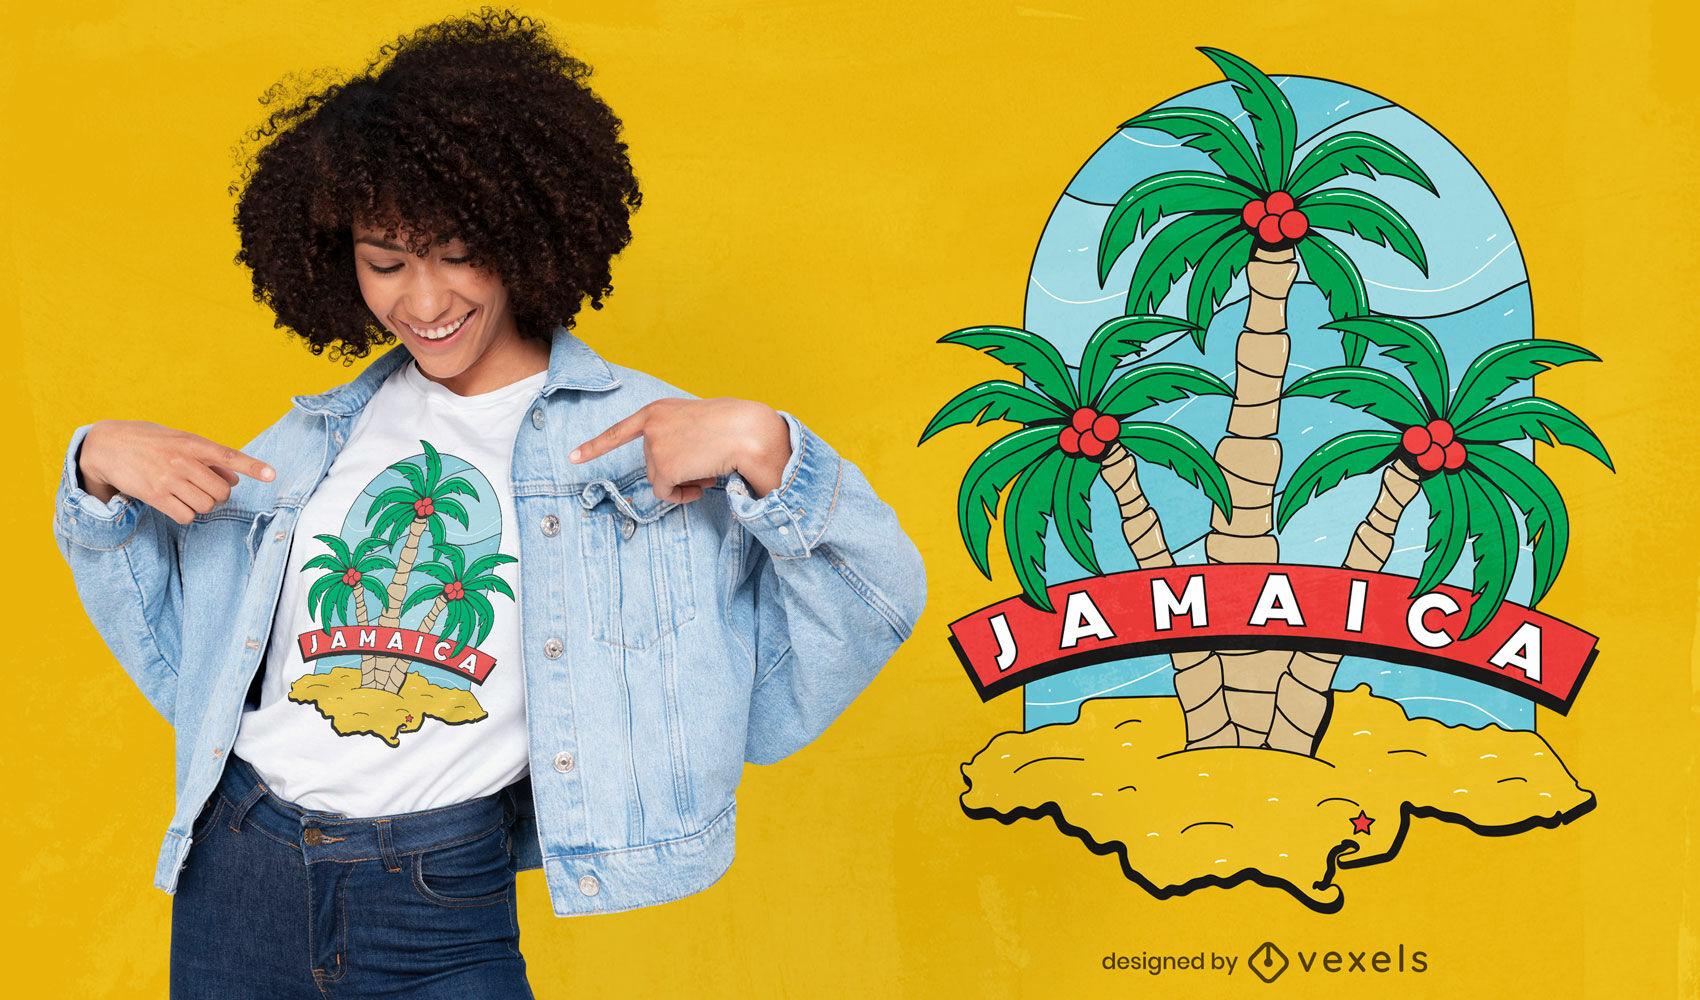 Diseño de camiseta de palmeras de jamaica